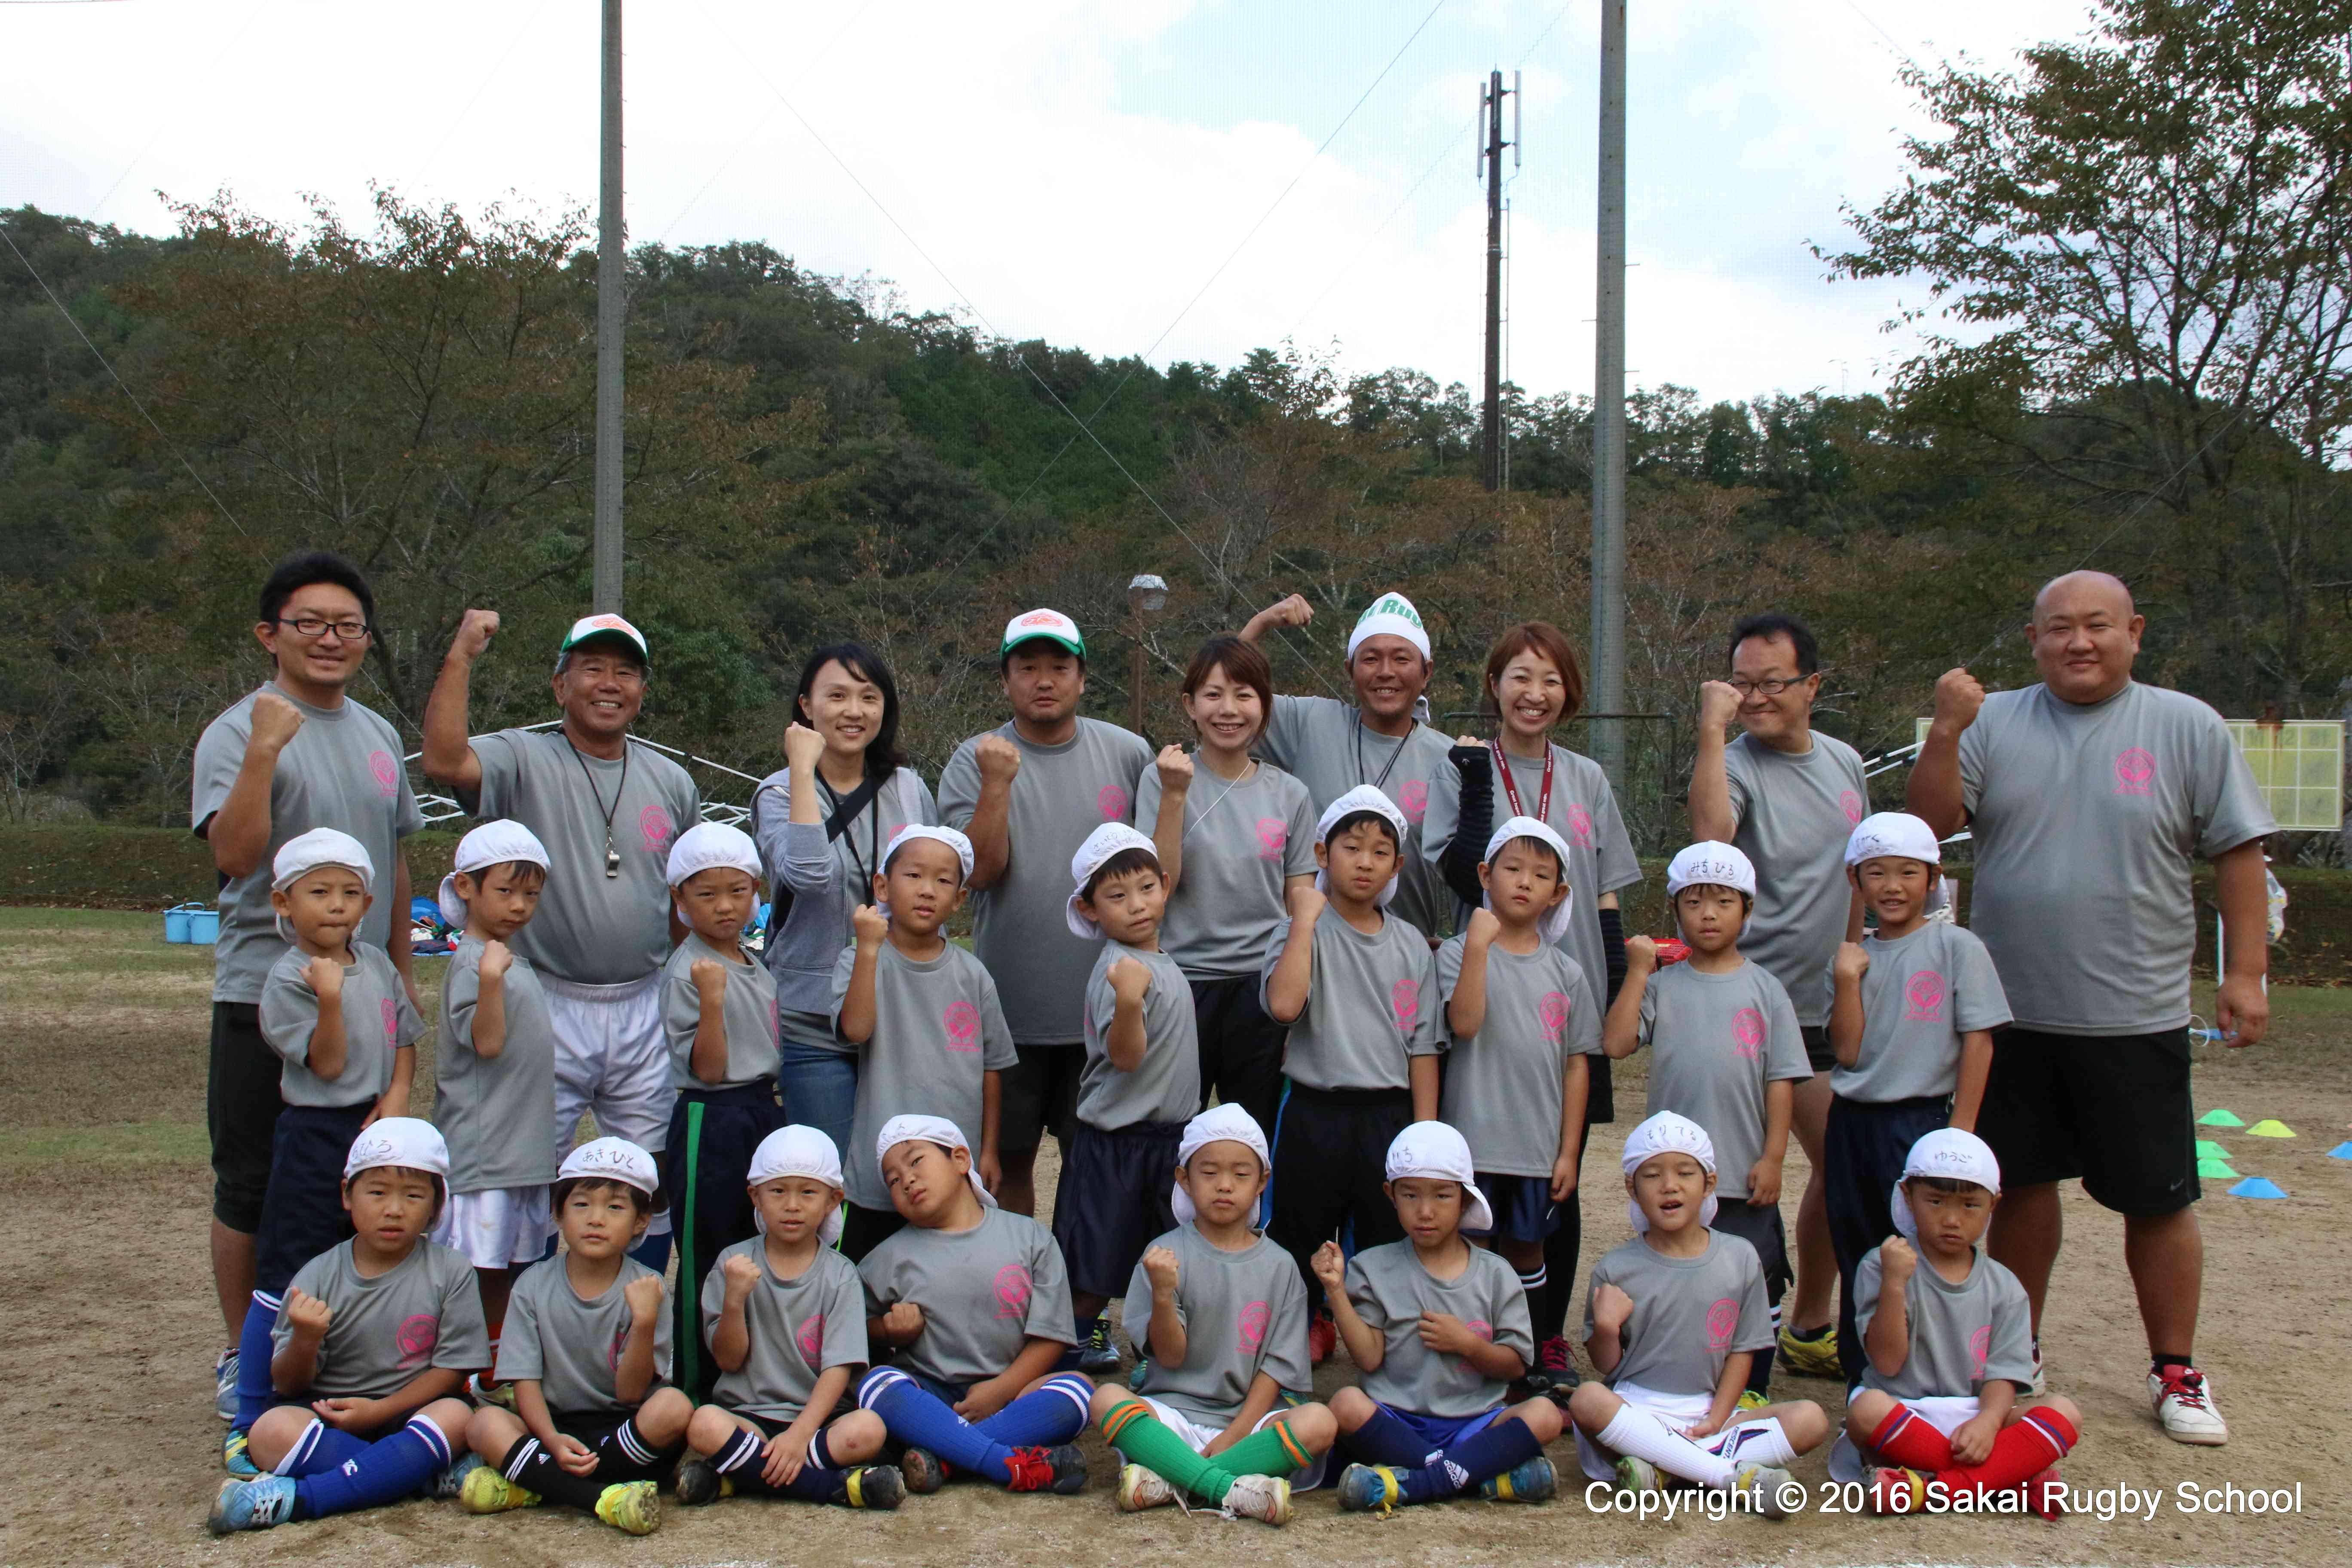 2016-10-10_gasshuku_7924_resize